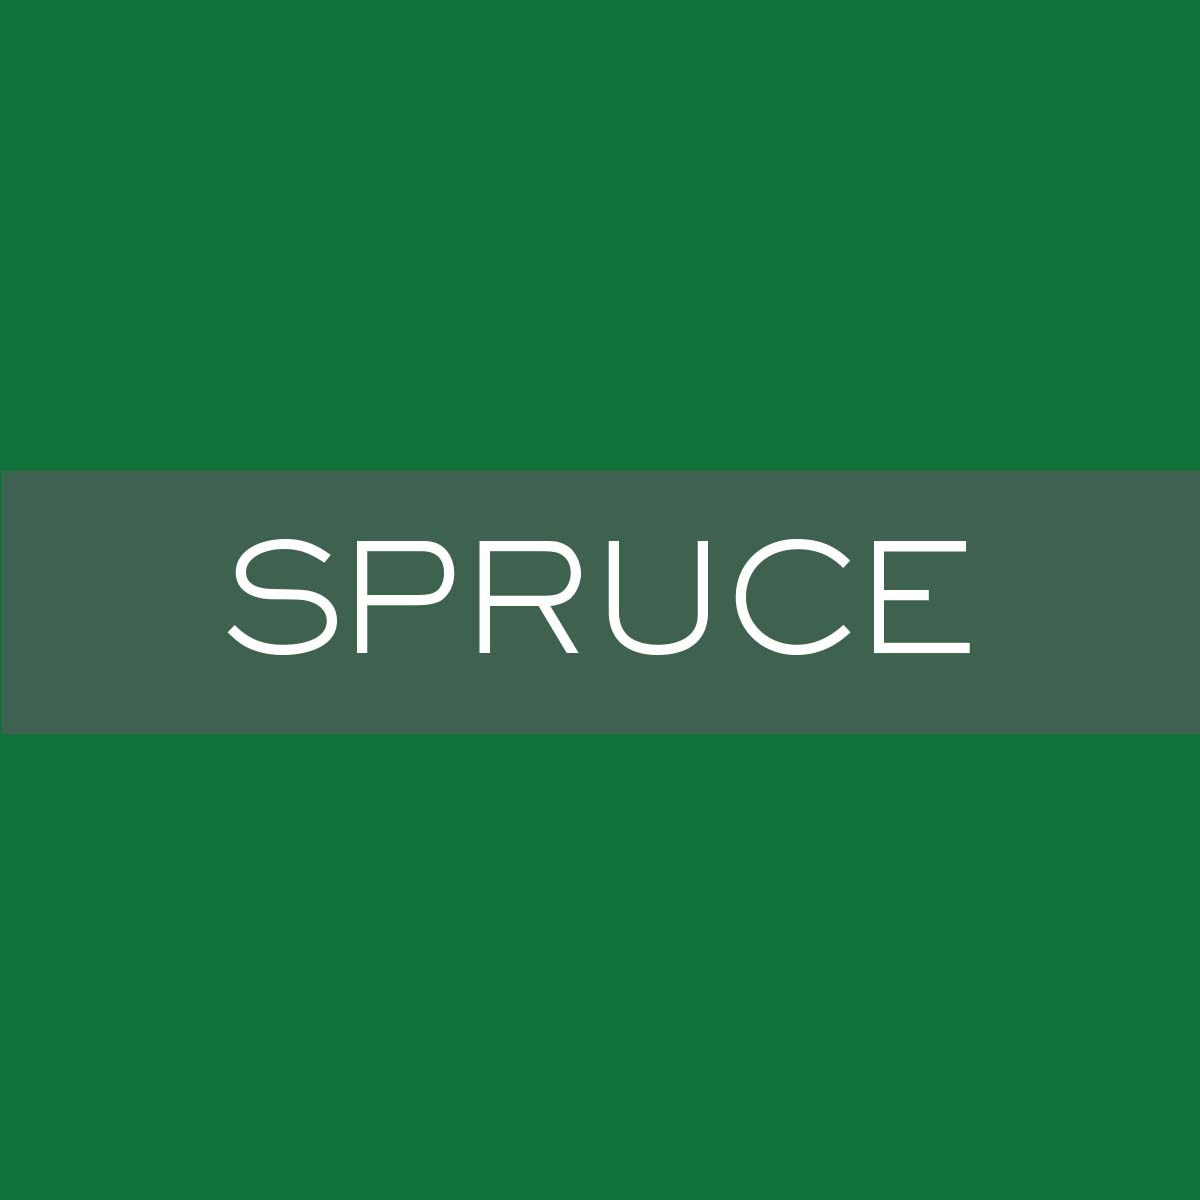 N&E_Spruce.jpg